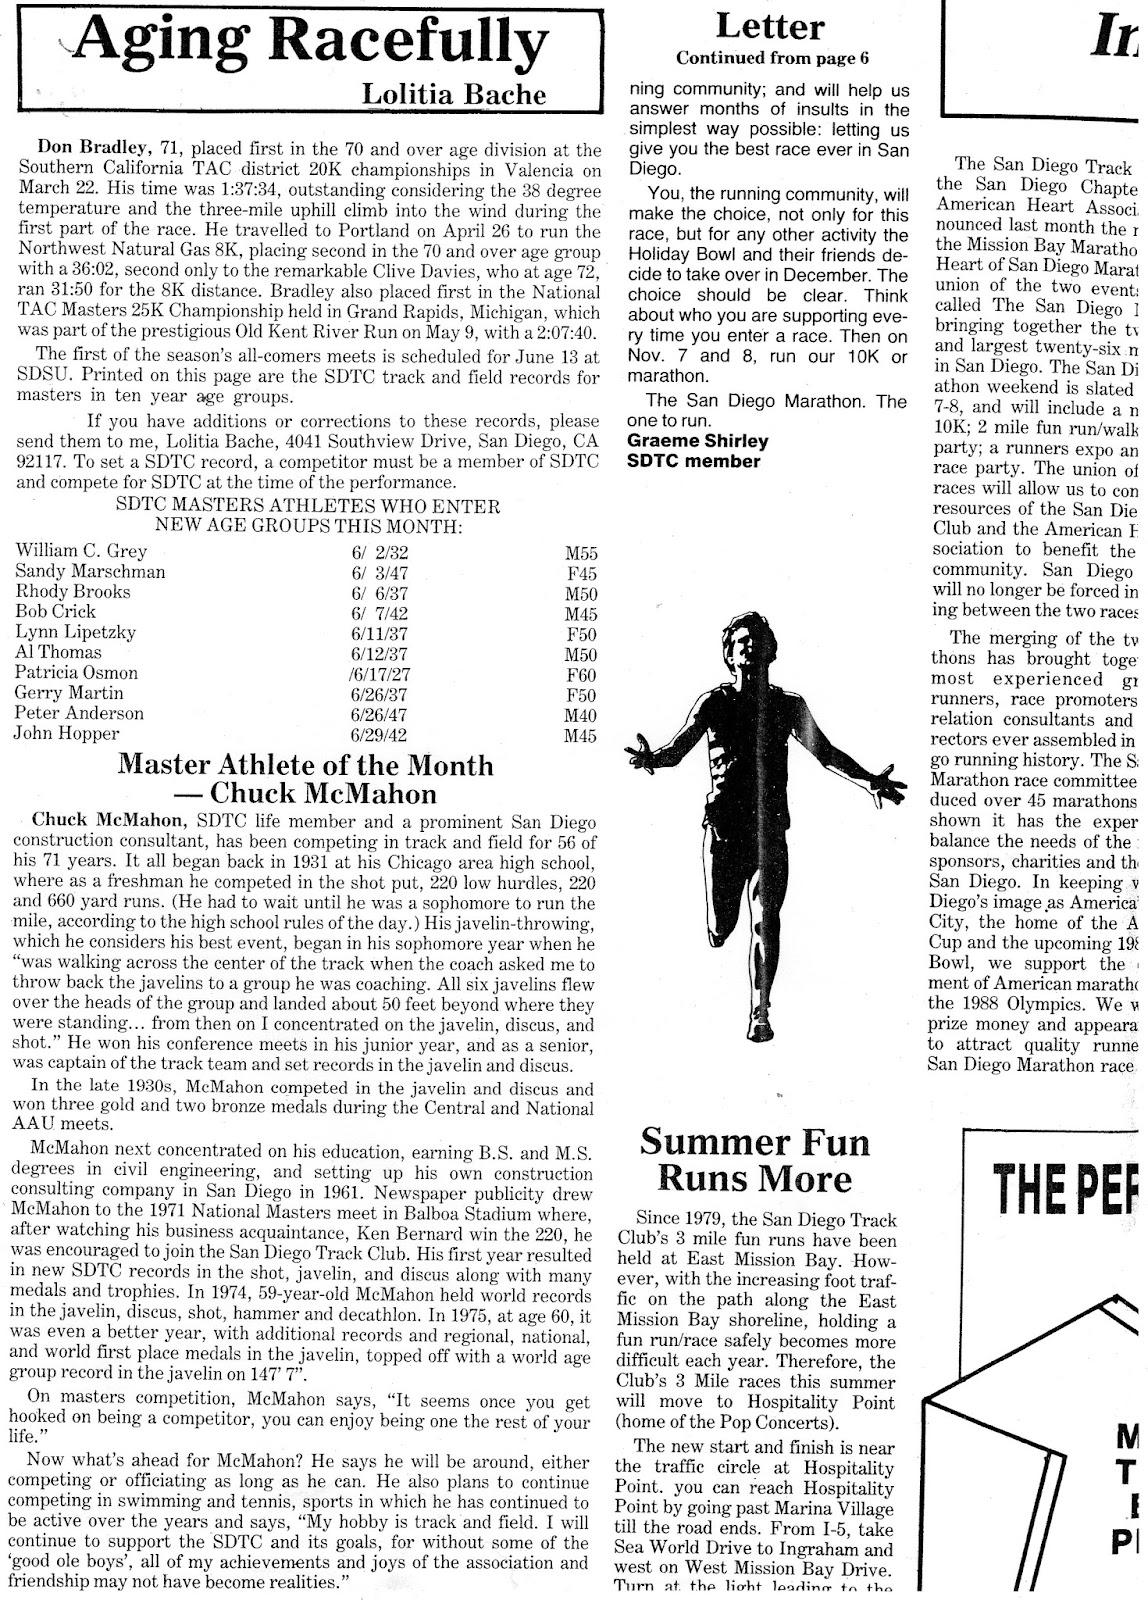 SDTC news June 1987.jpg